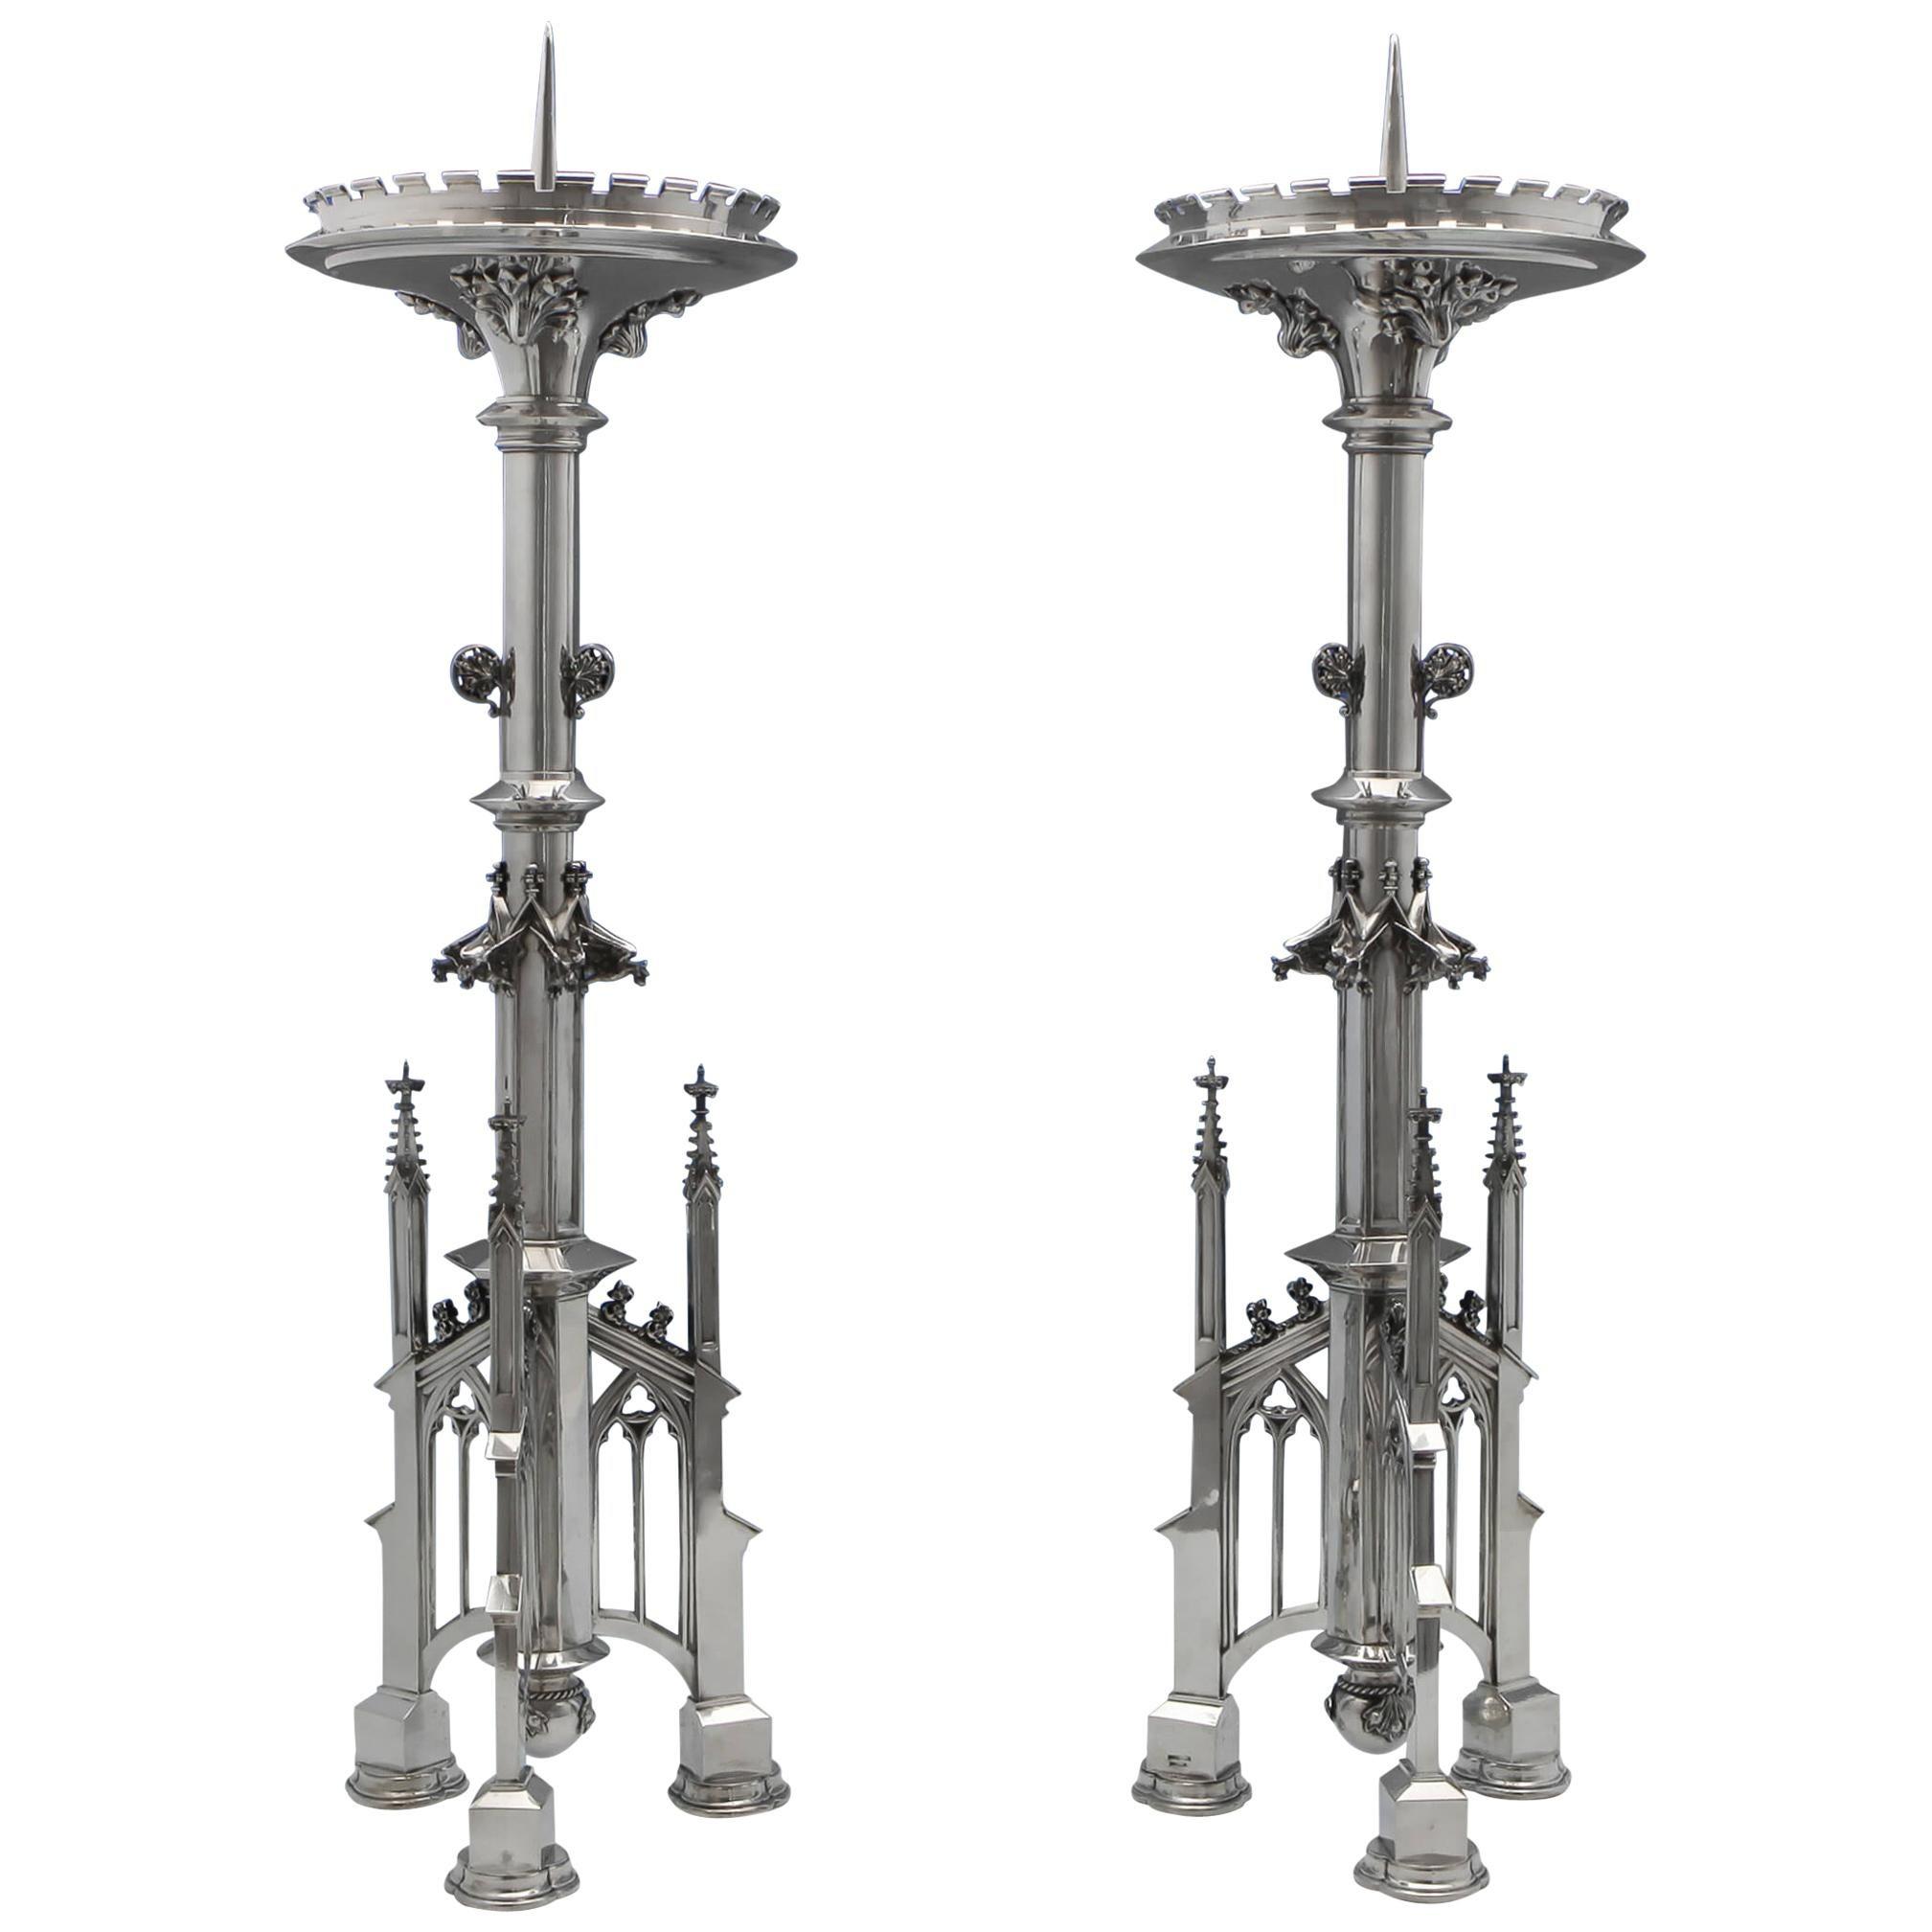 Antique German Silver Gothic Revival Candlesticks c.1890 Retailed Janssen & Co.